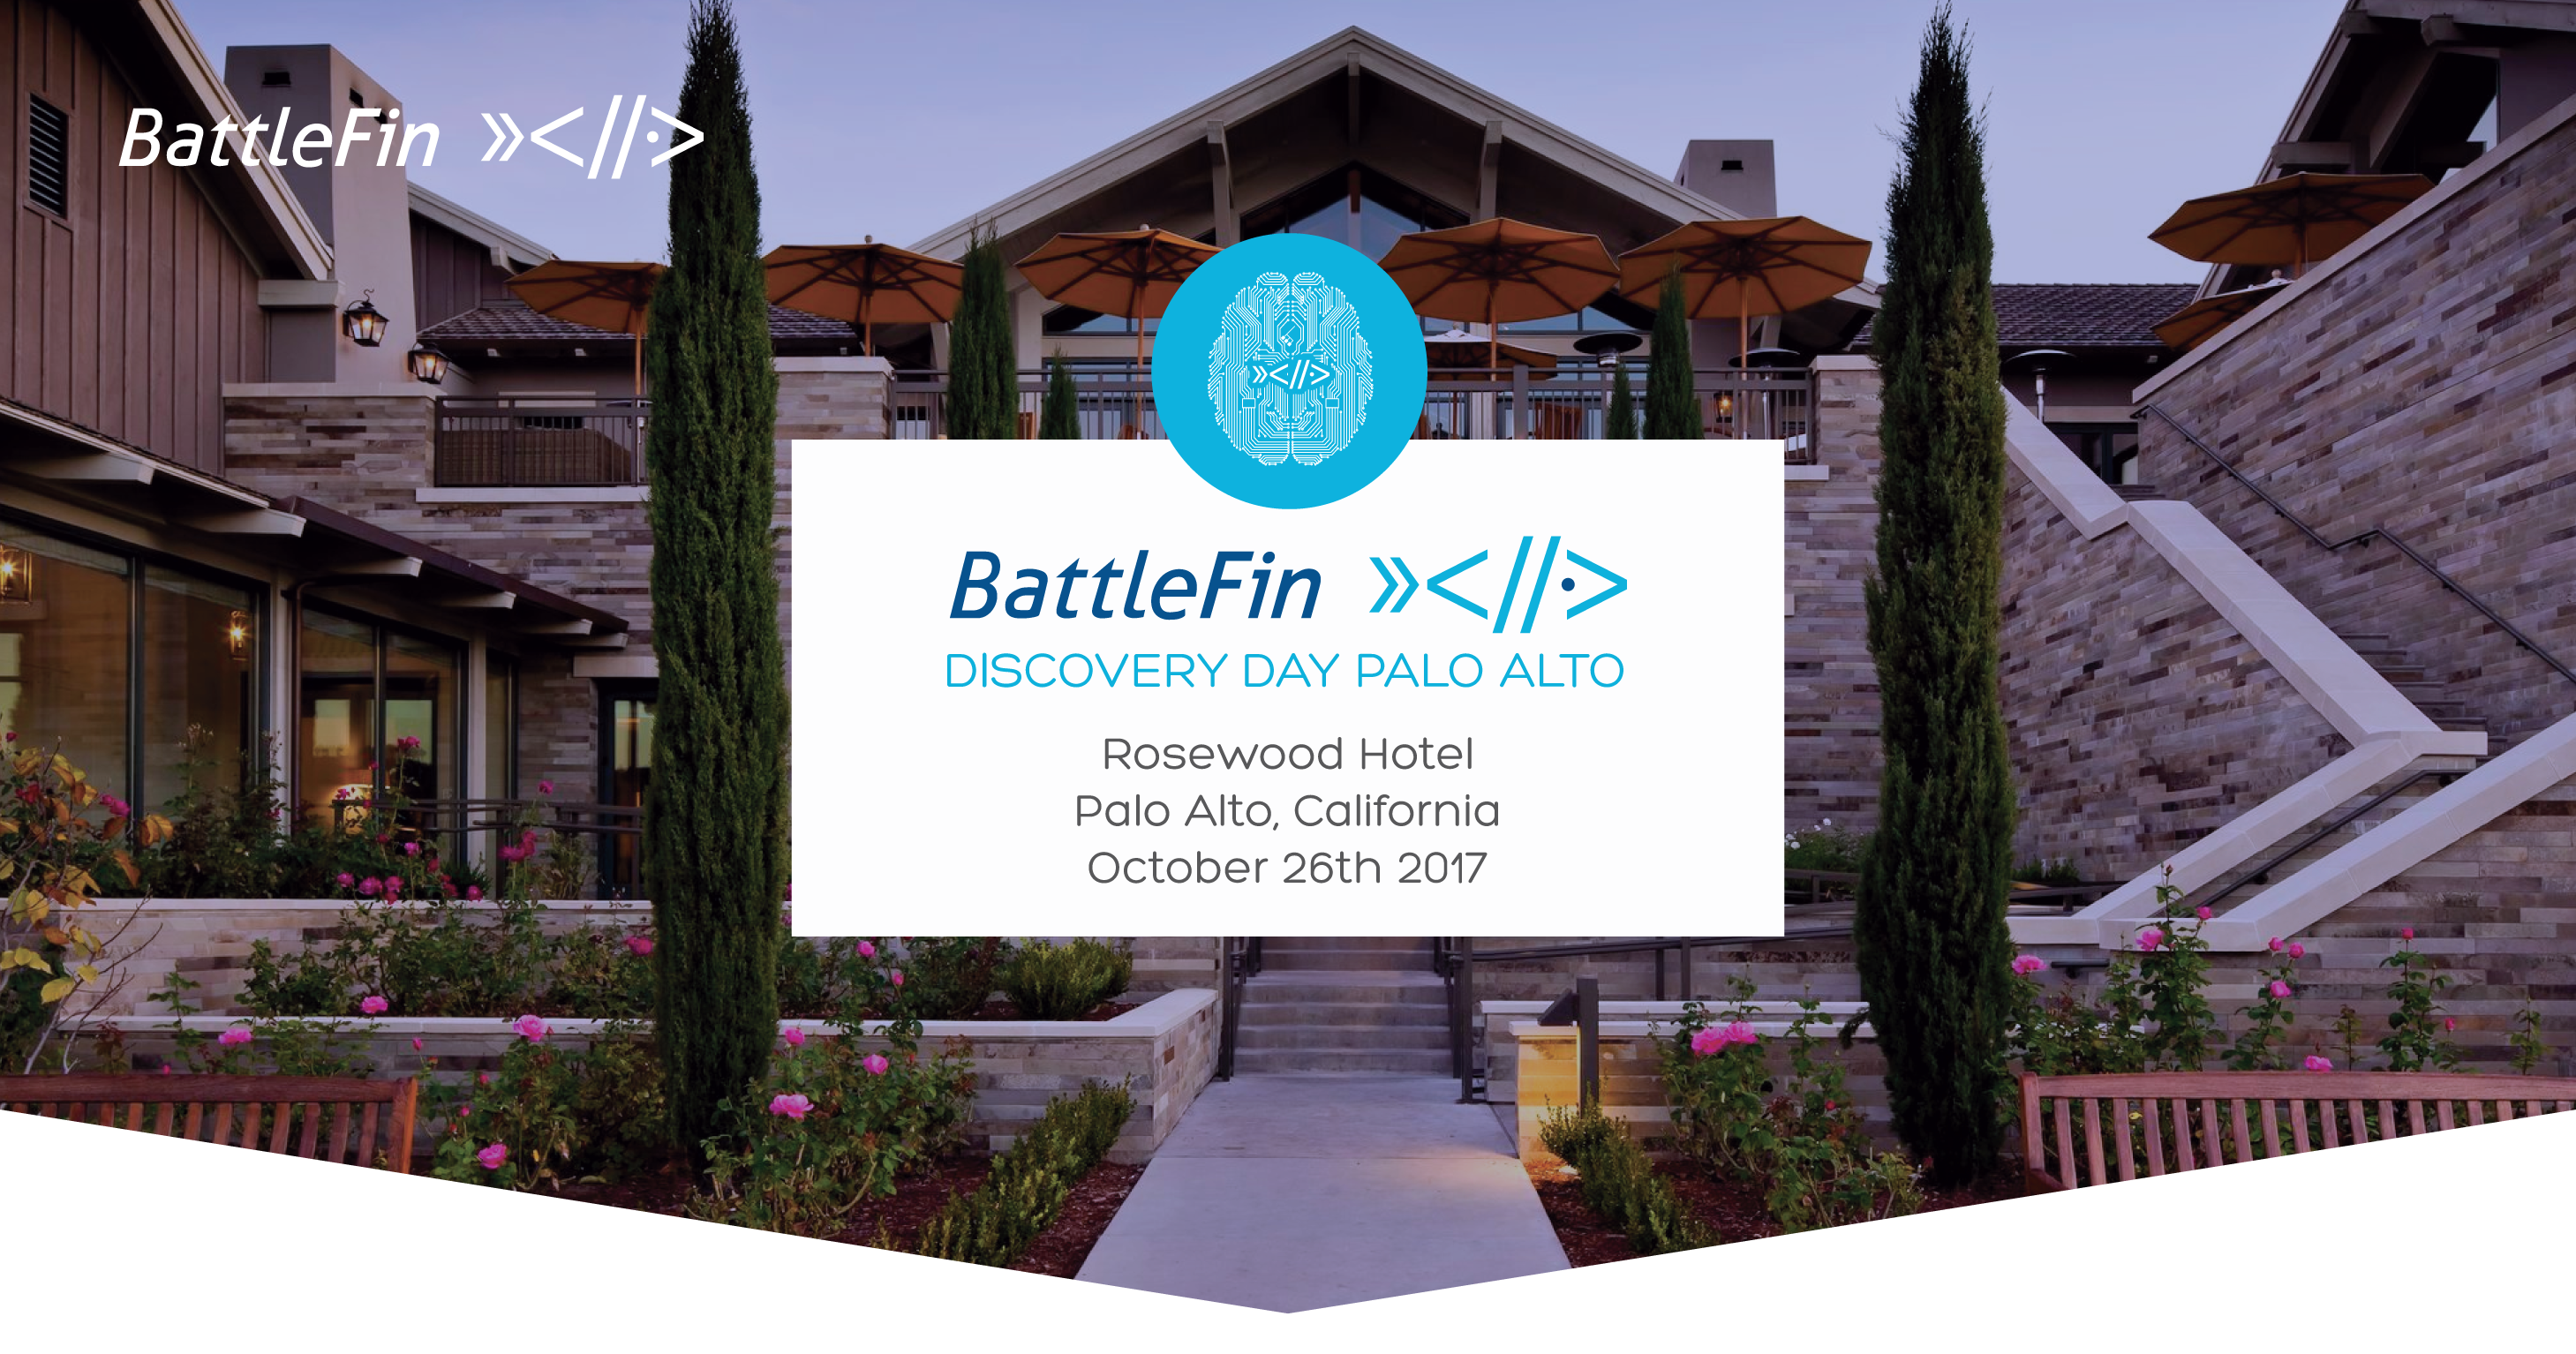 BattleFin-Palo Alto Header -GRAPHICS-03.png